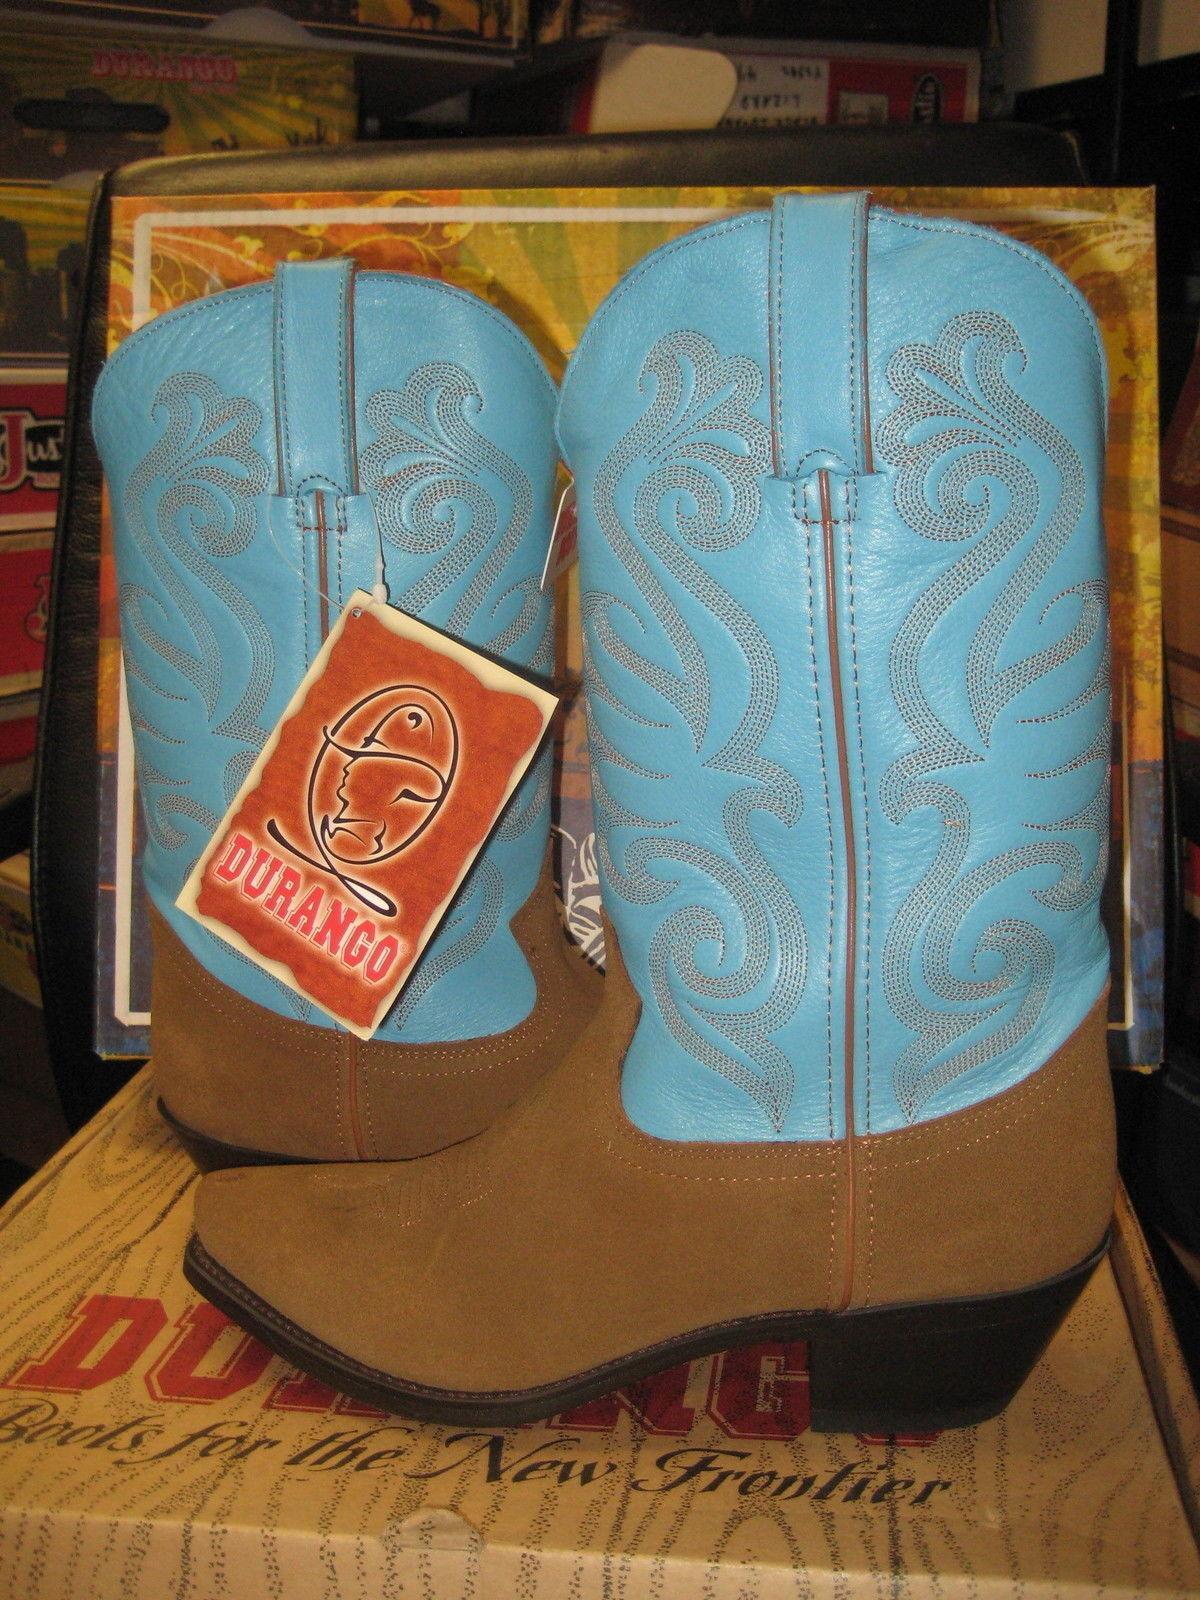 Durango women's women's women's Boots RD5102 Brown Suade foot and sky bluee shaft dcb8b9